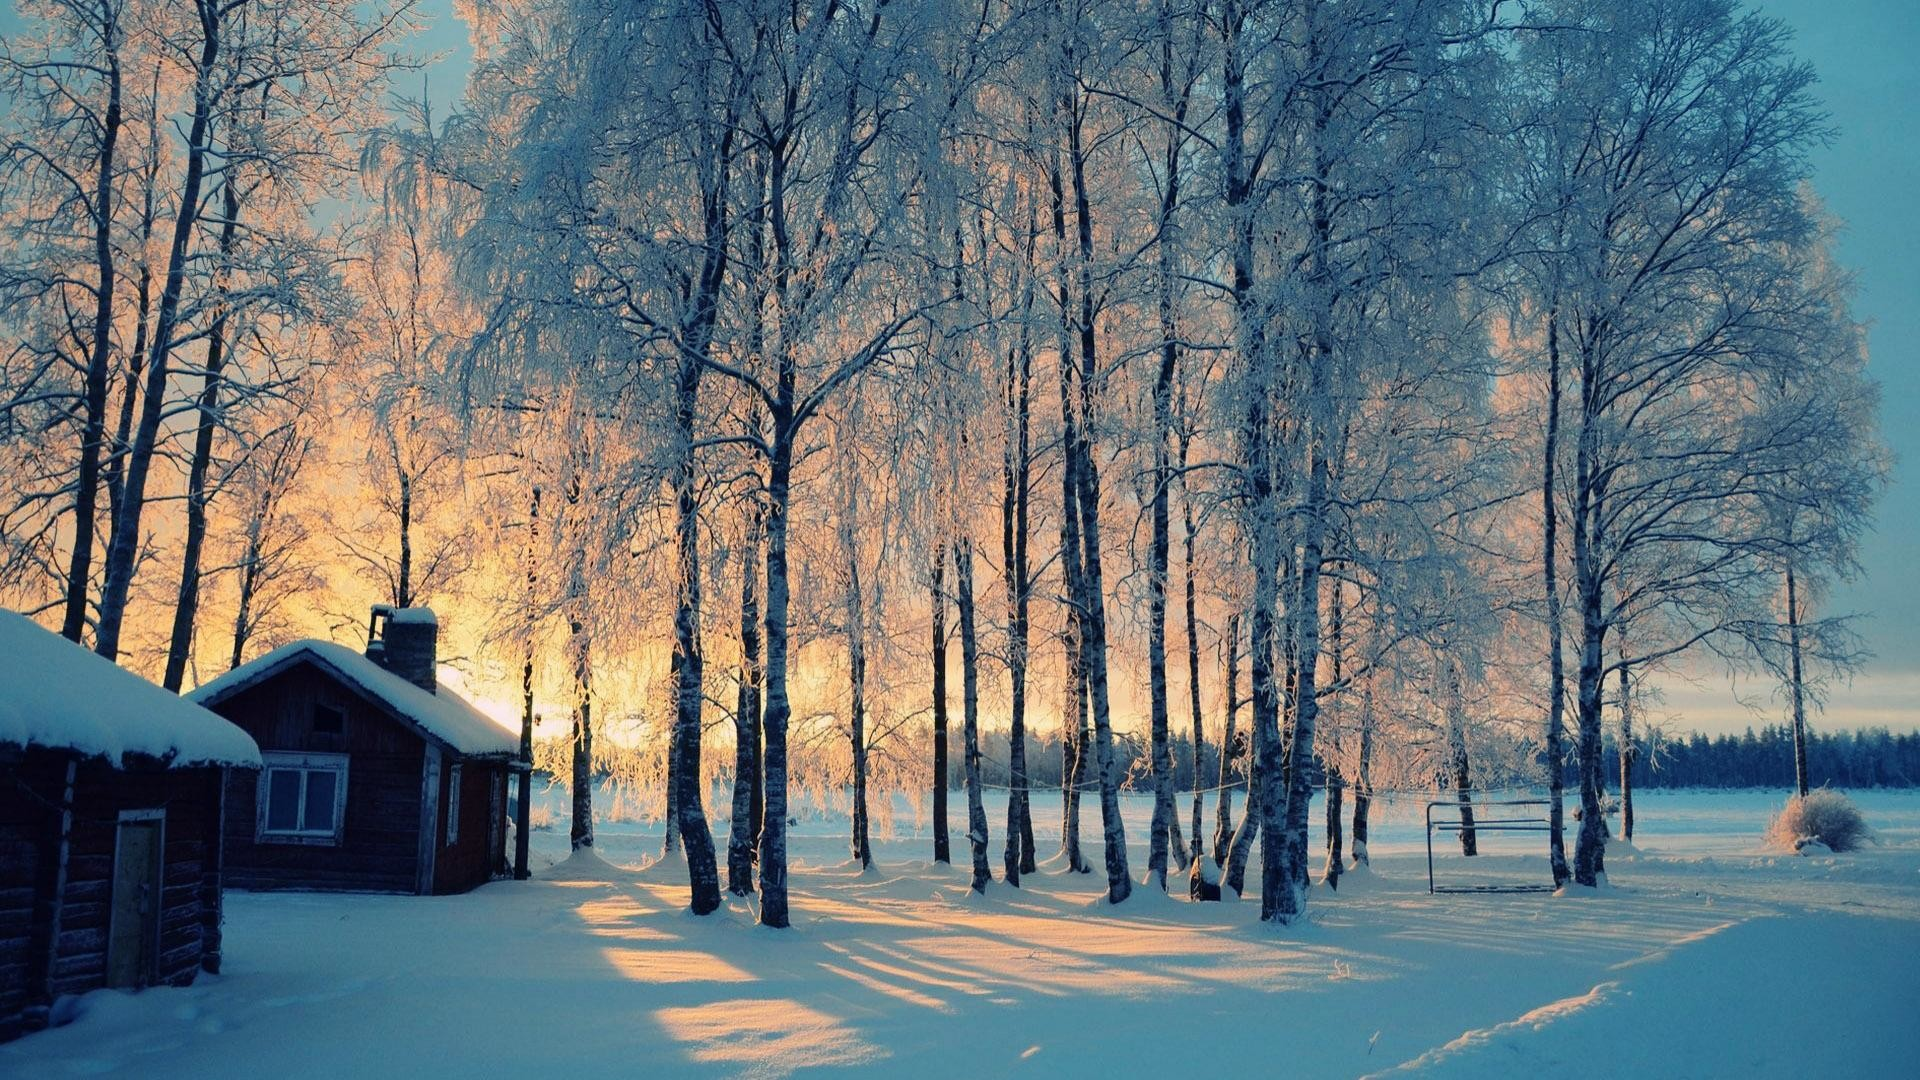 Winter-wallpaper-HD-for-PC